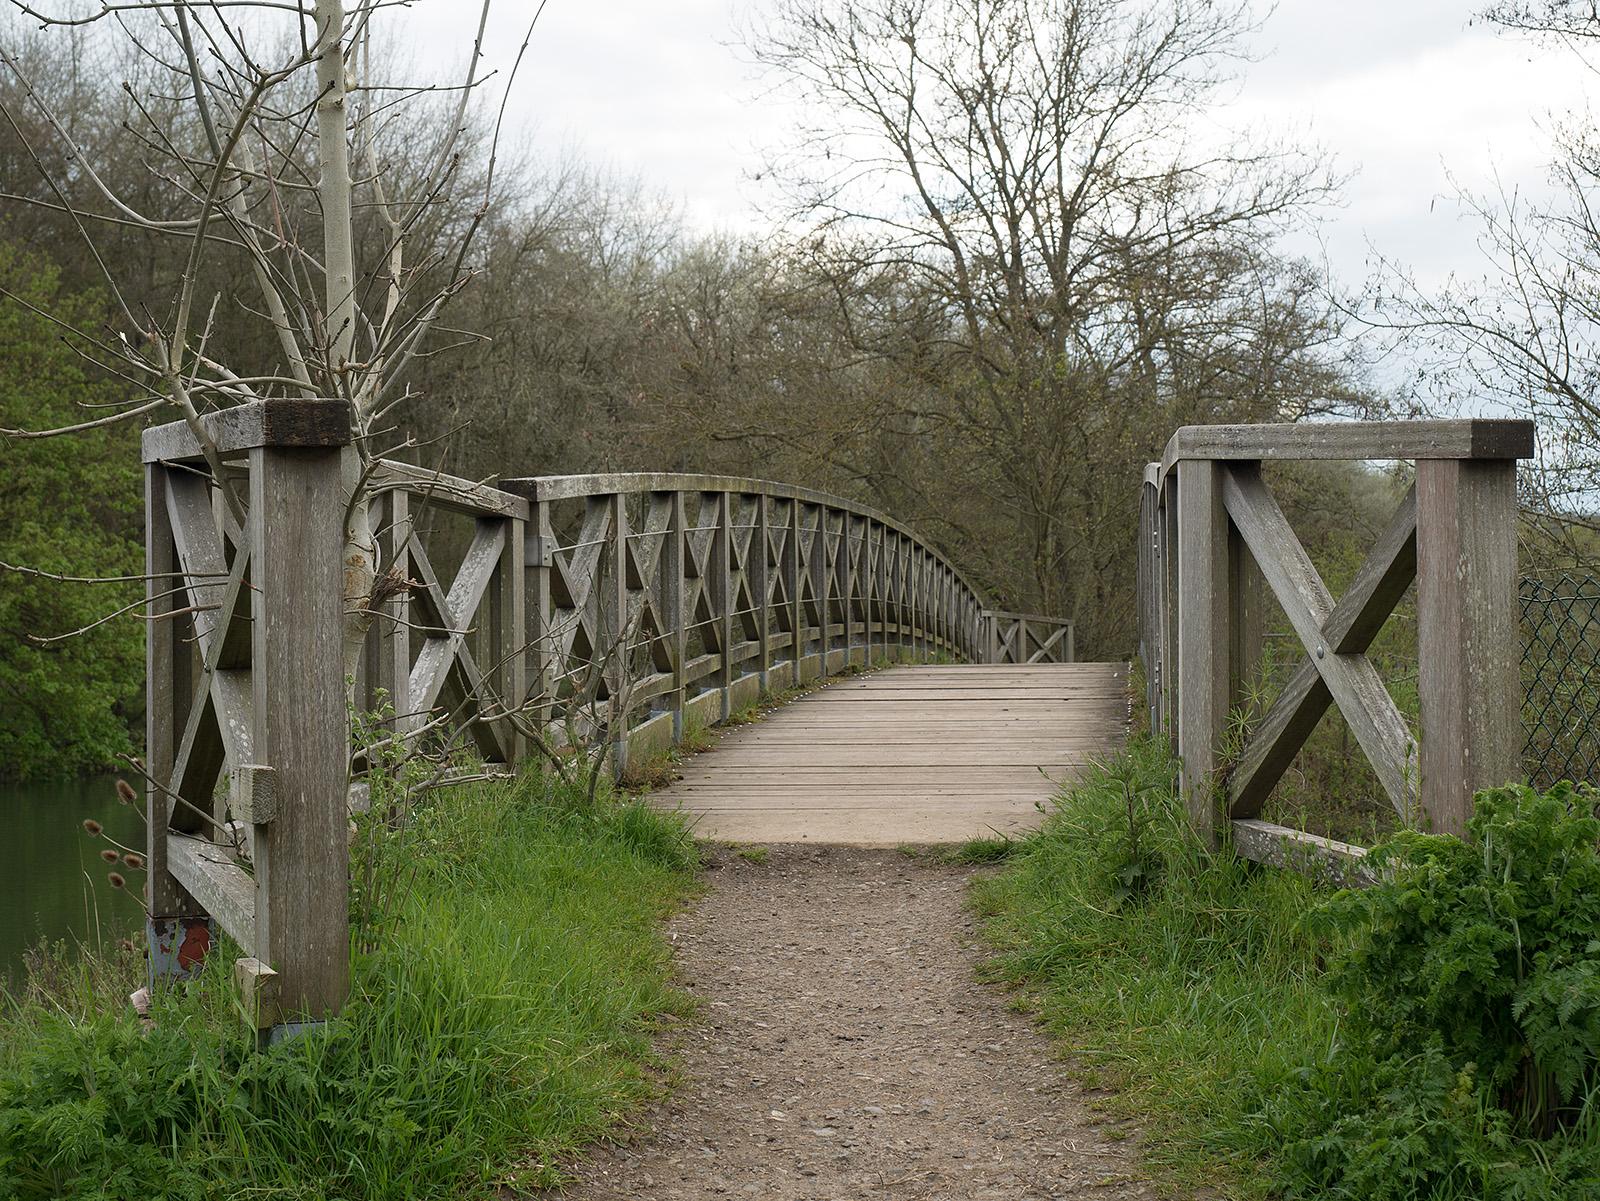 Wooden bridge at Dorchester